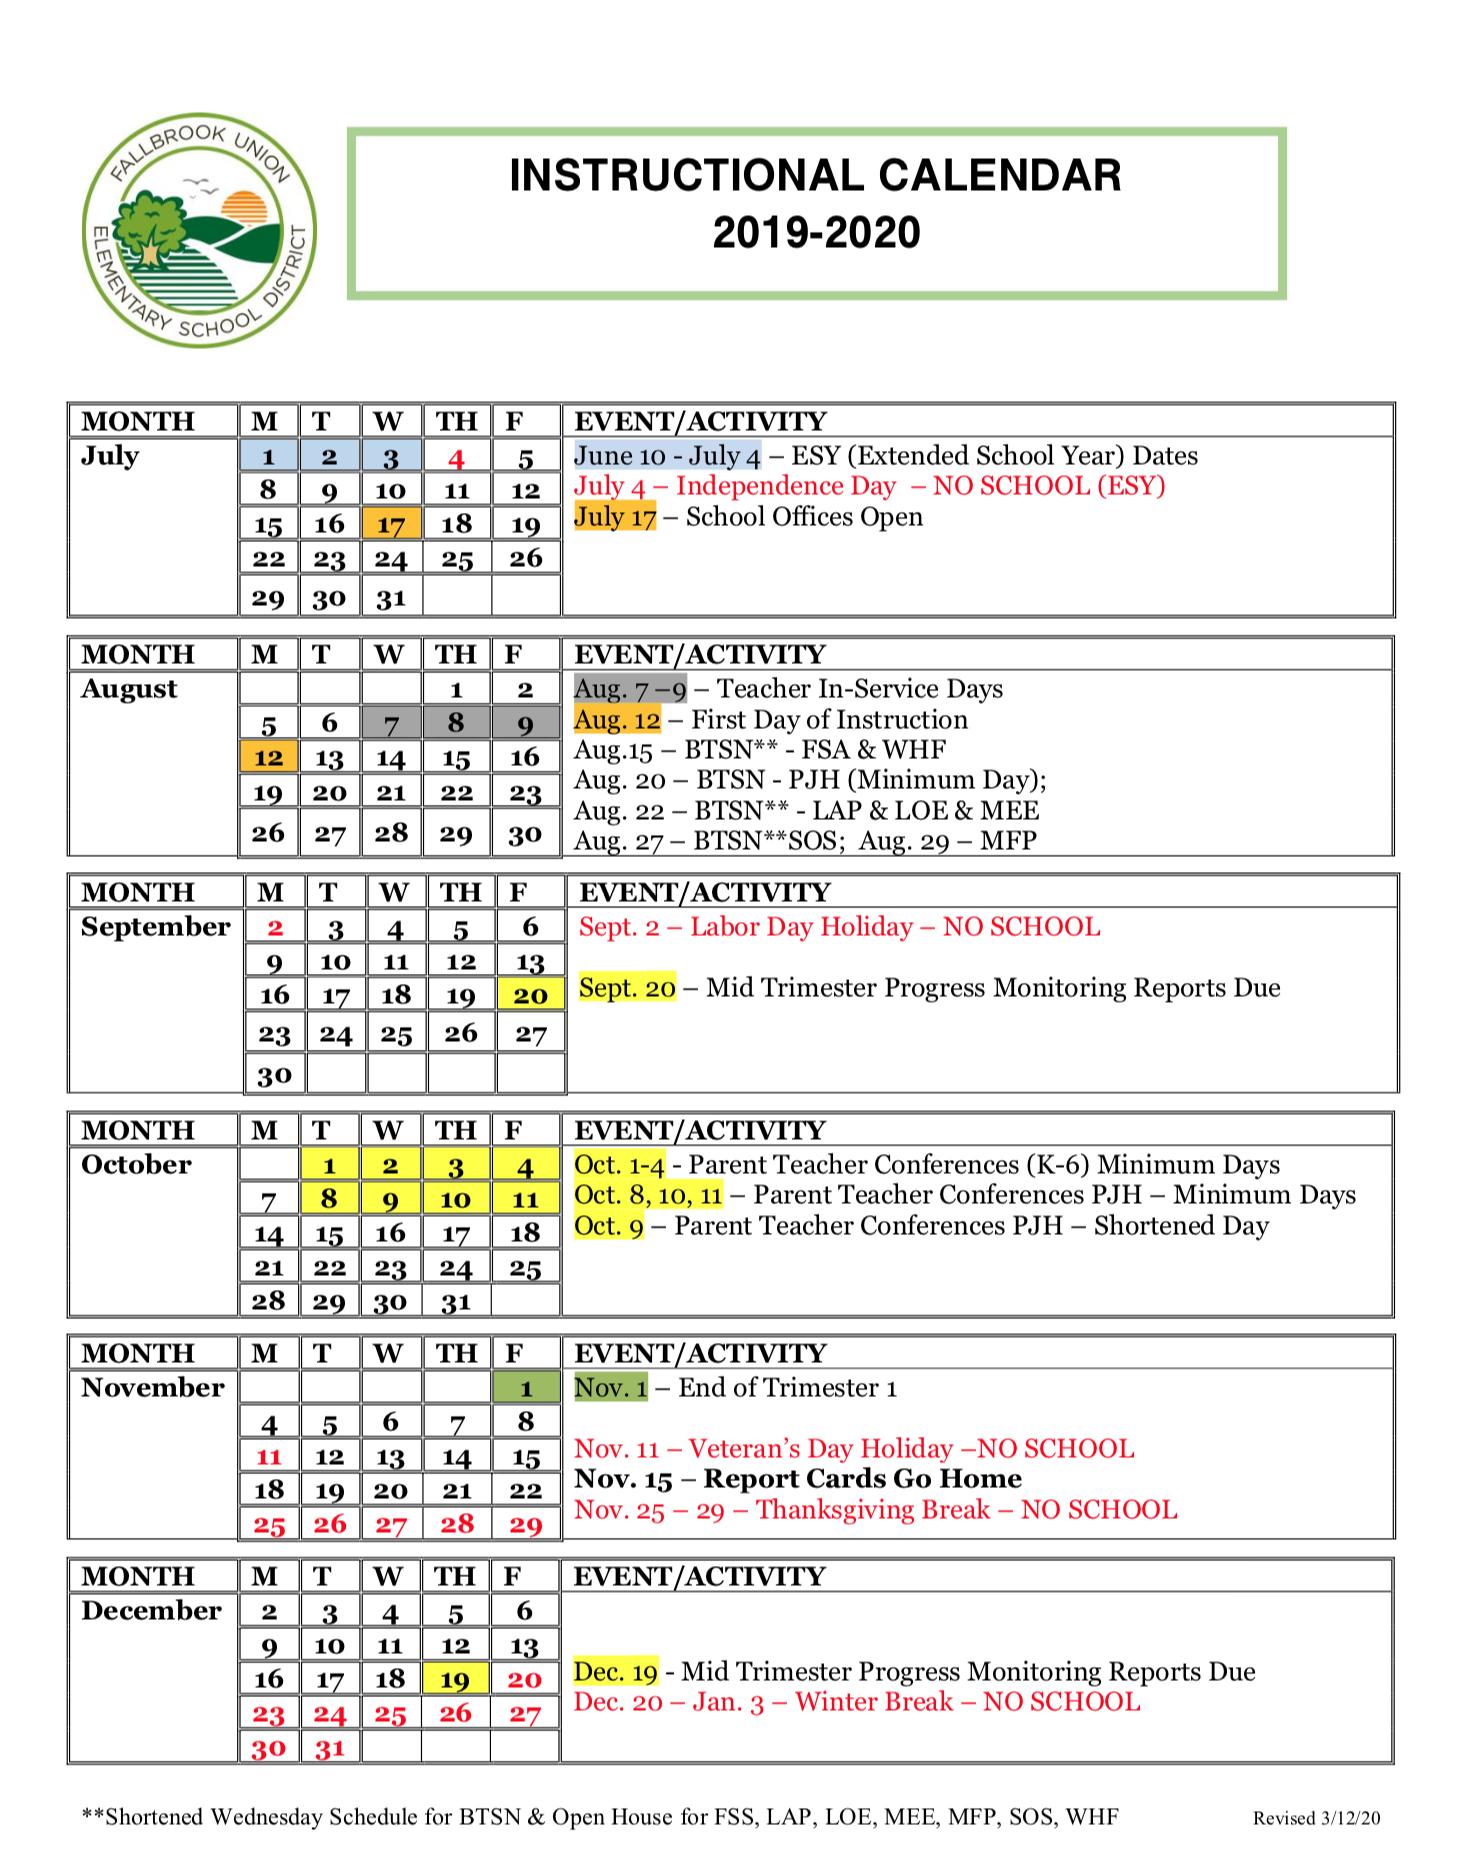 Instructional Calendar | Fallbrook Union Elementary School Inside William And Mary School Calendar 2021 2020